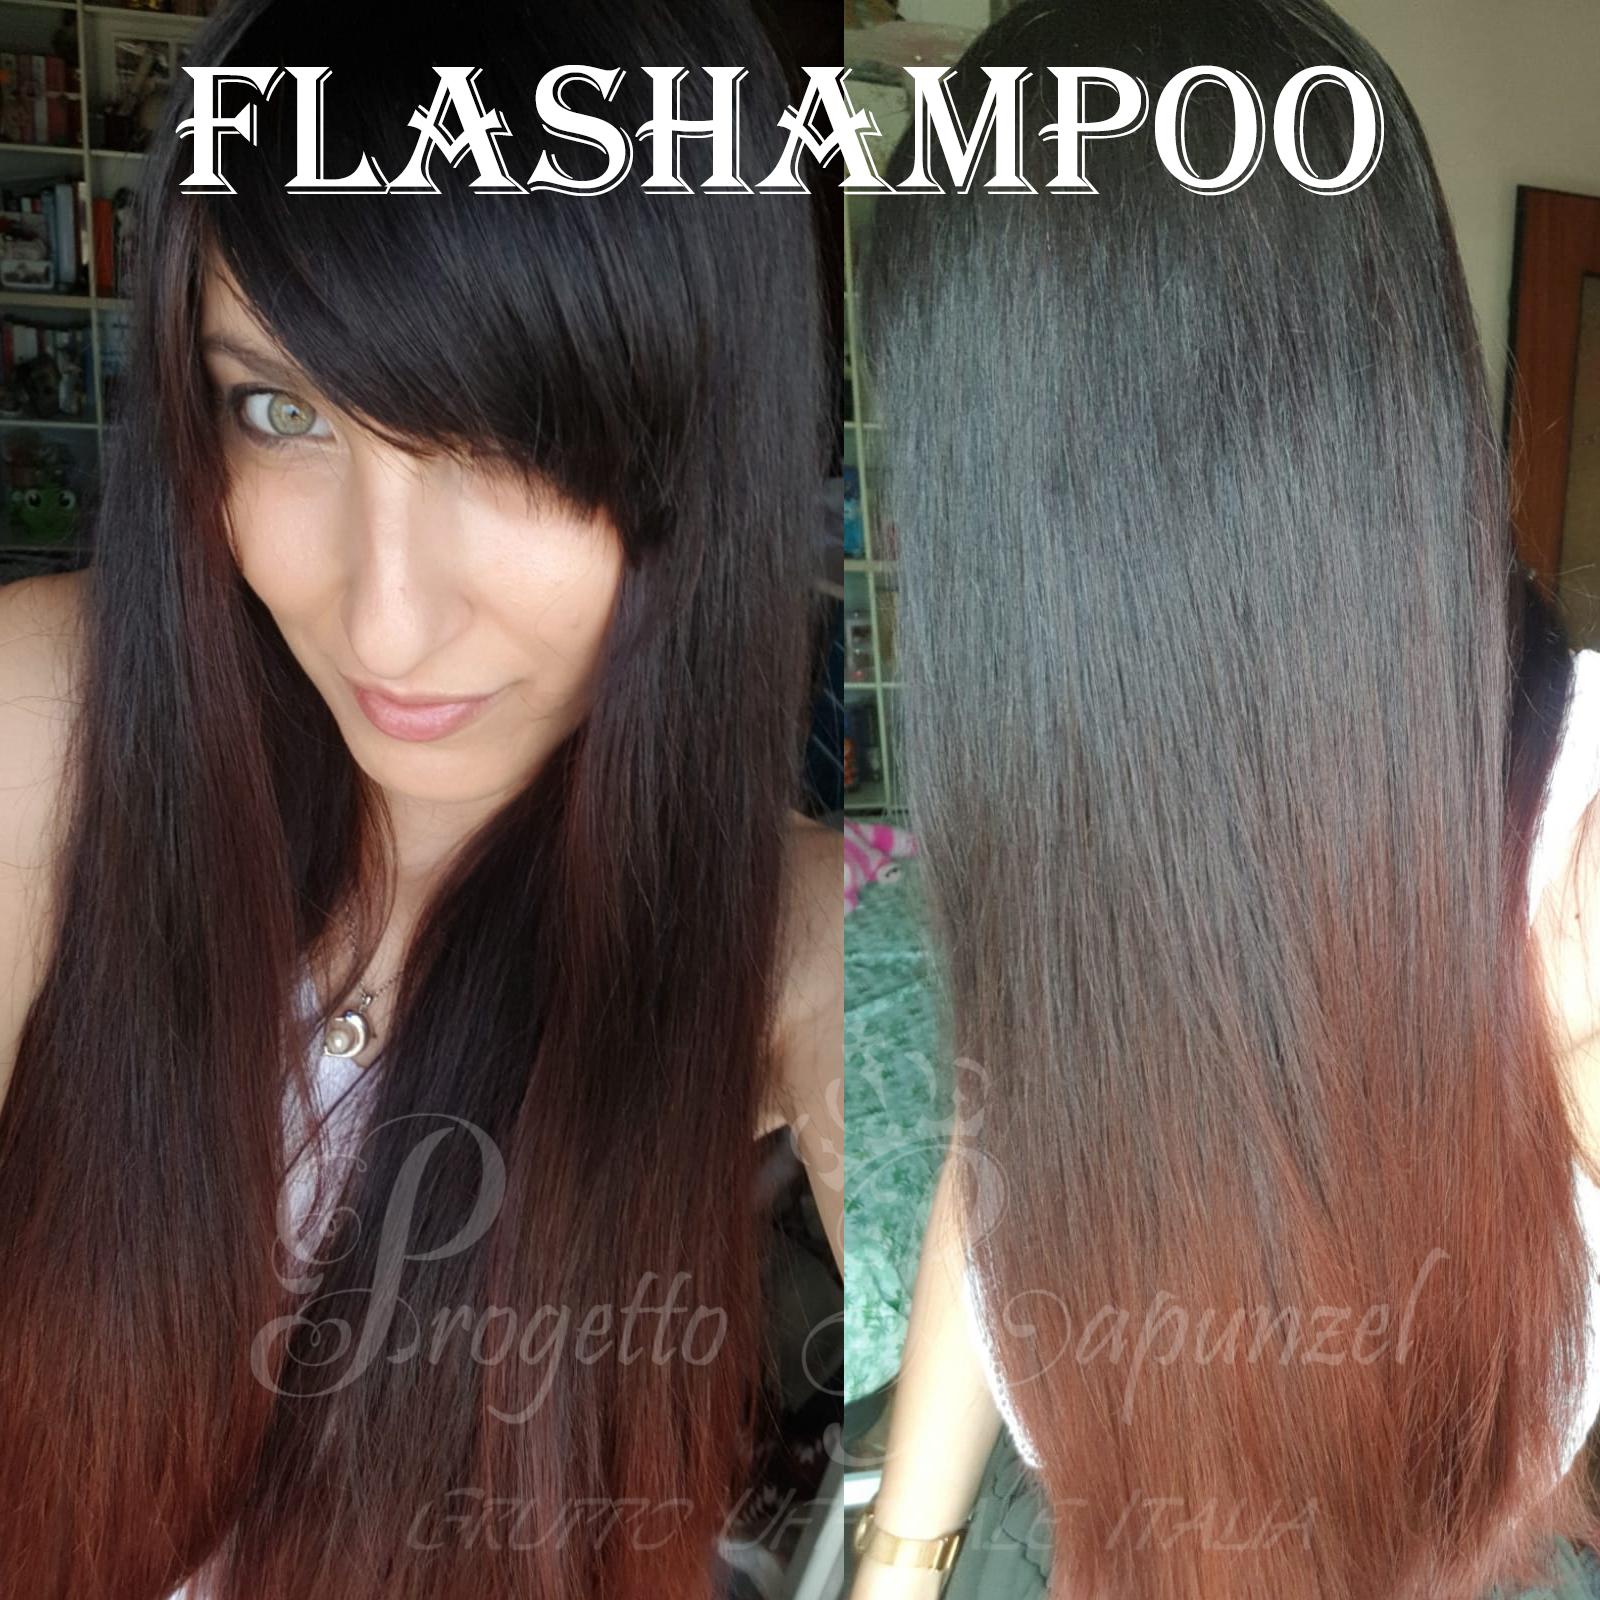 Flashampoo